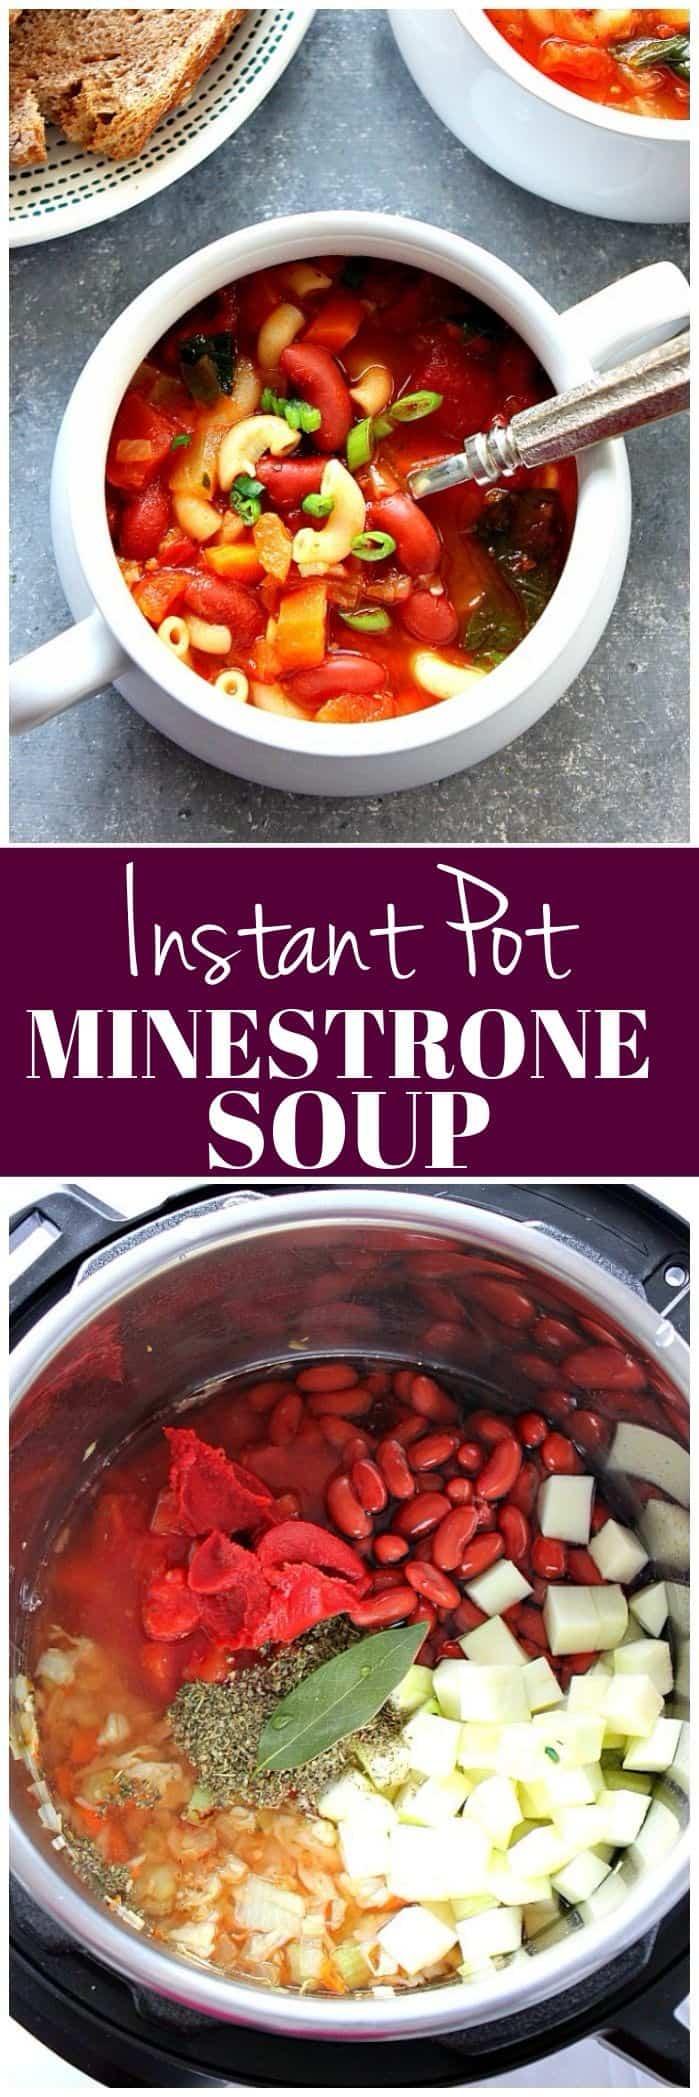 Instant Pot Minestrone Soup Recipe long1 Instant Pot Minestrone Soup Recipe